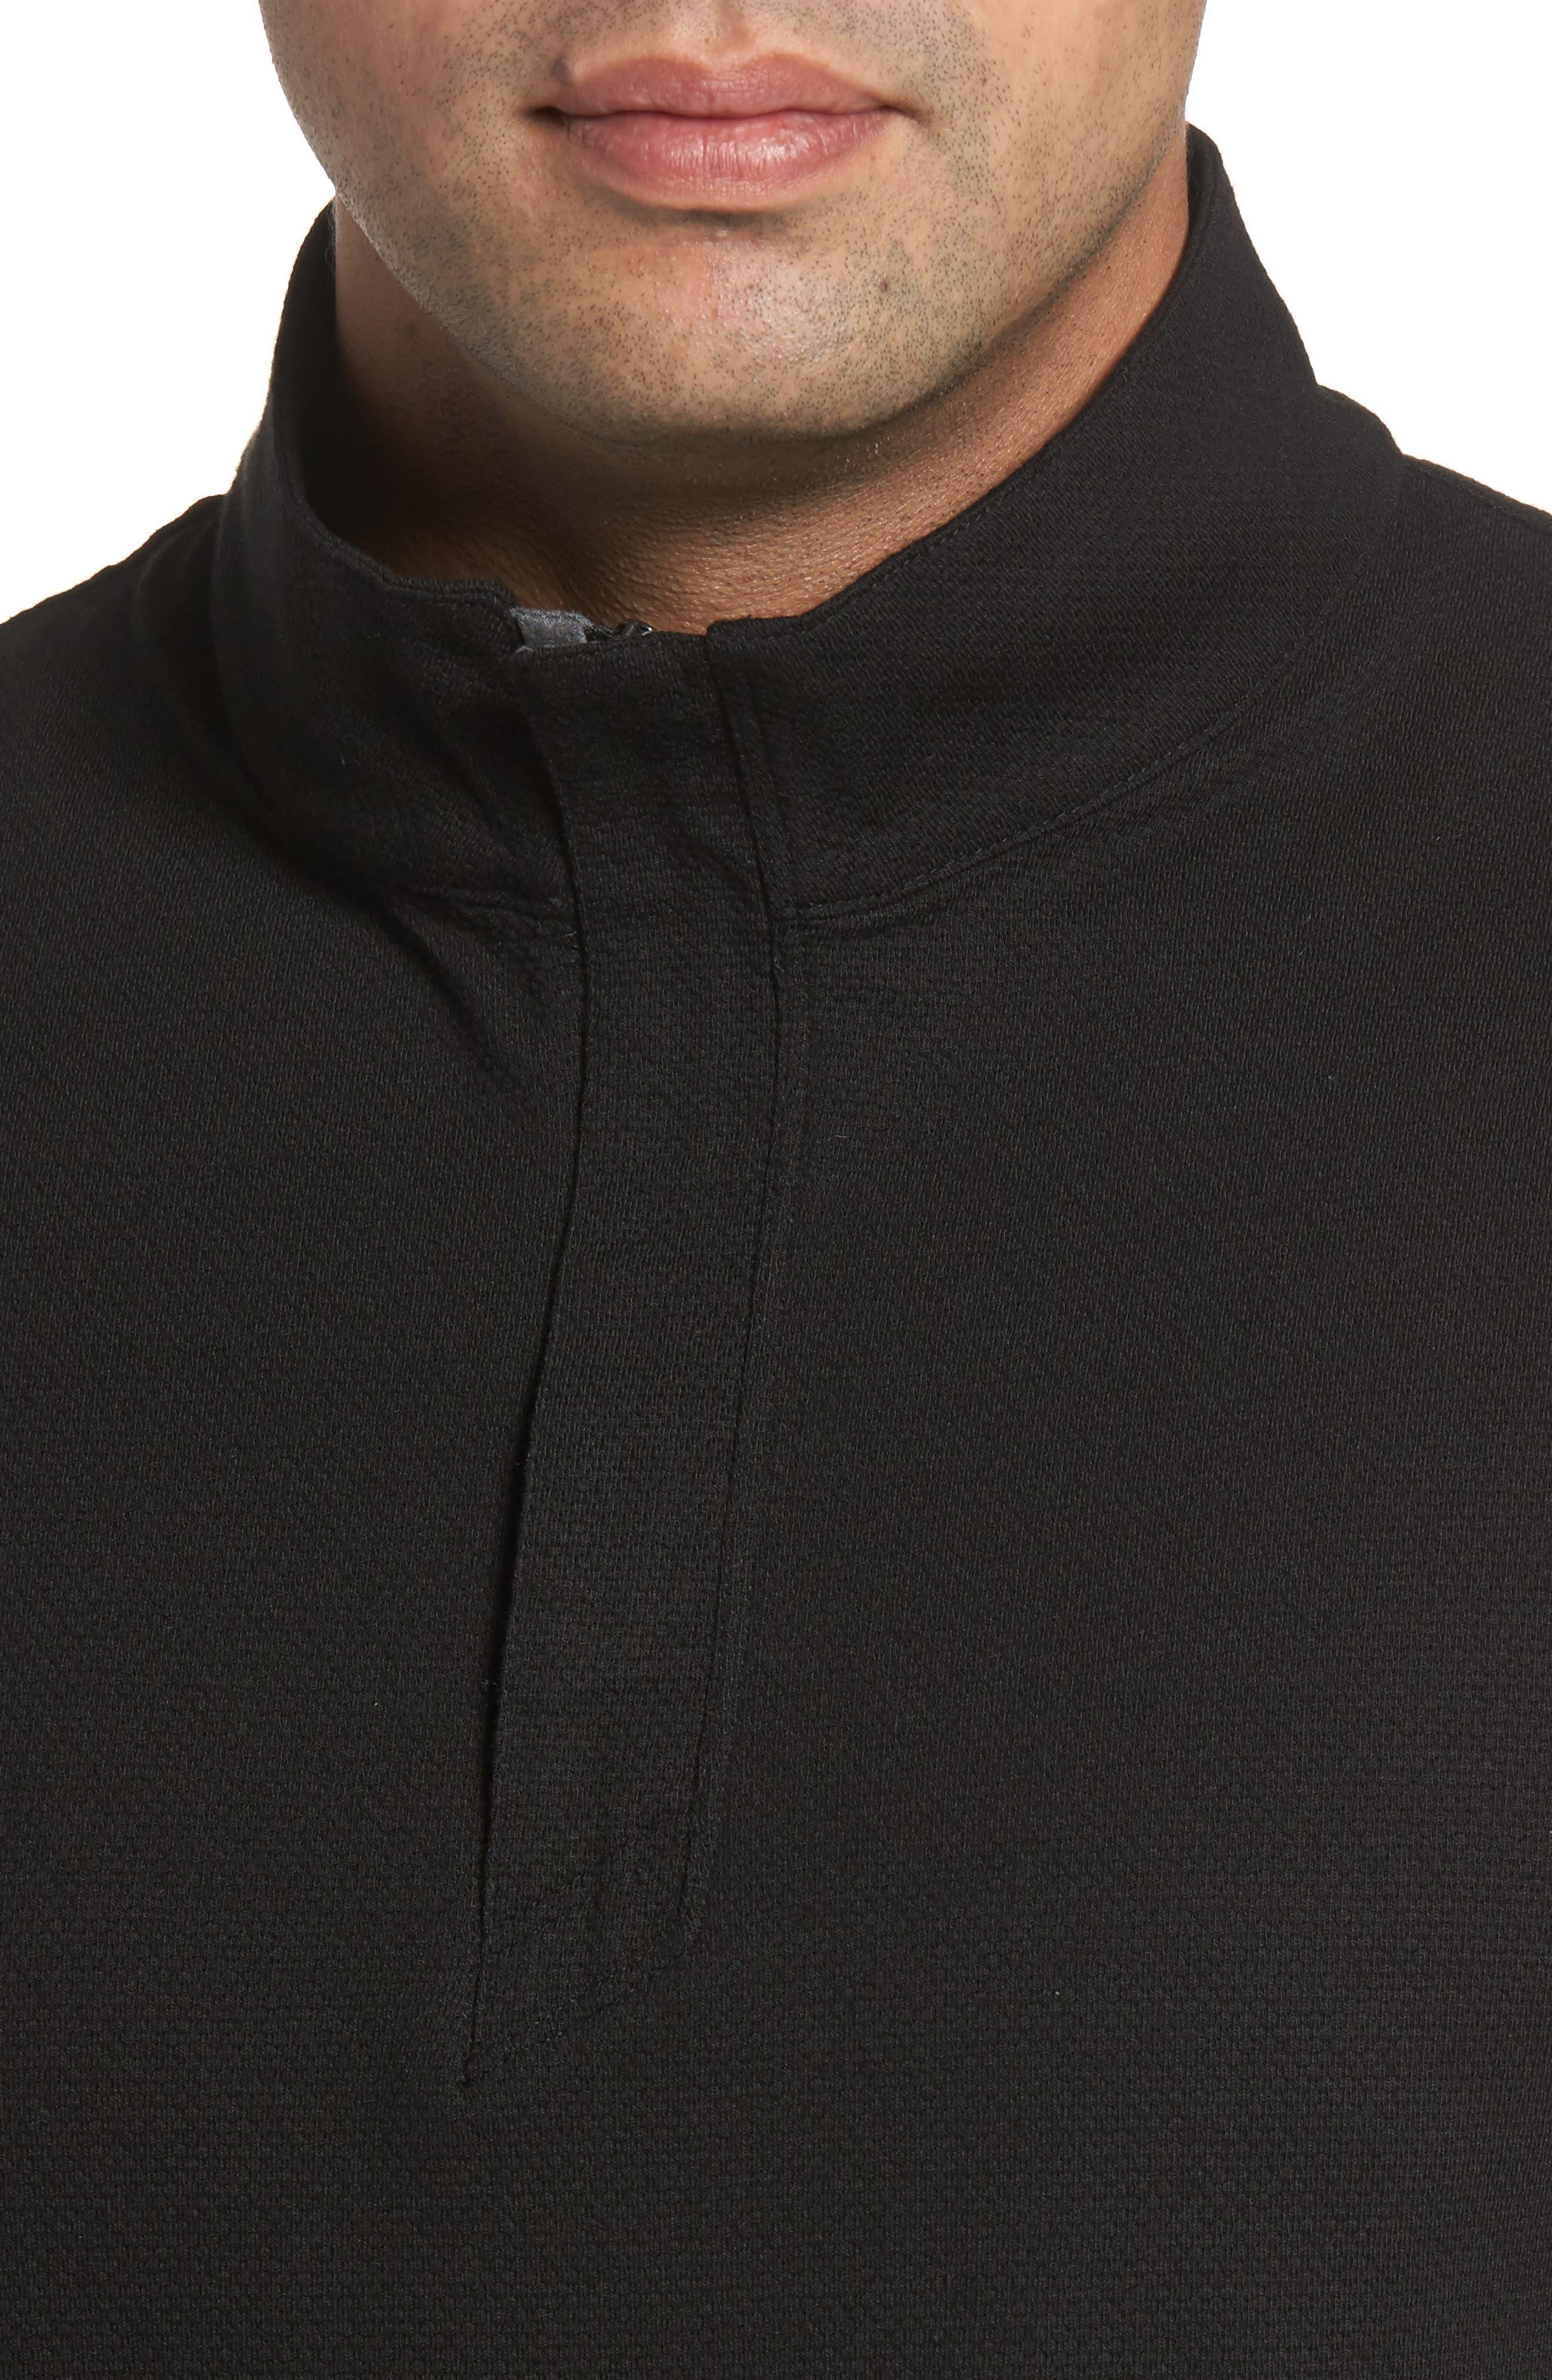 Hewitt Quarter Zip Pullover,                             Alternate thumbnail 4, color,                             Black